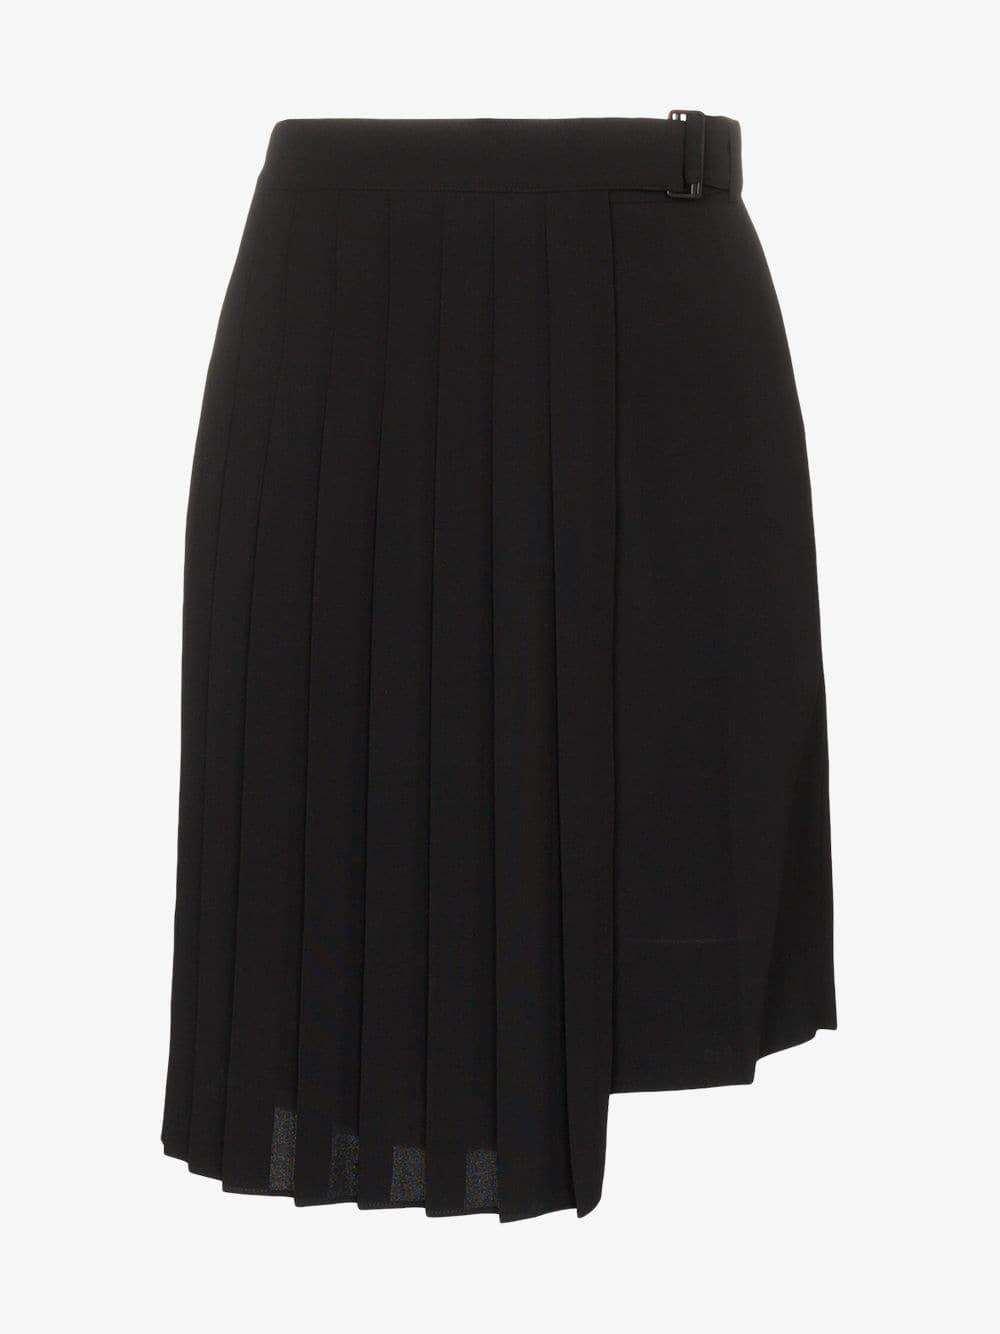 Juun.J pleated apron skirt in black